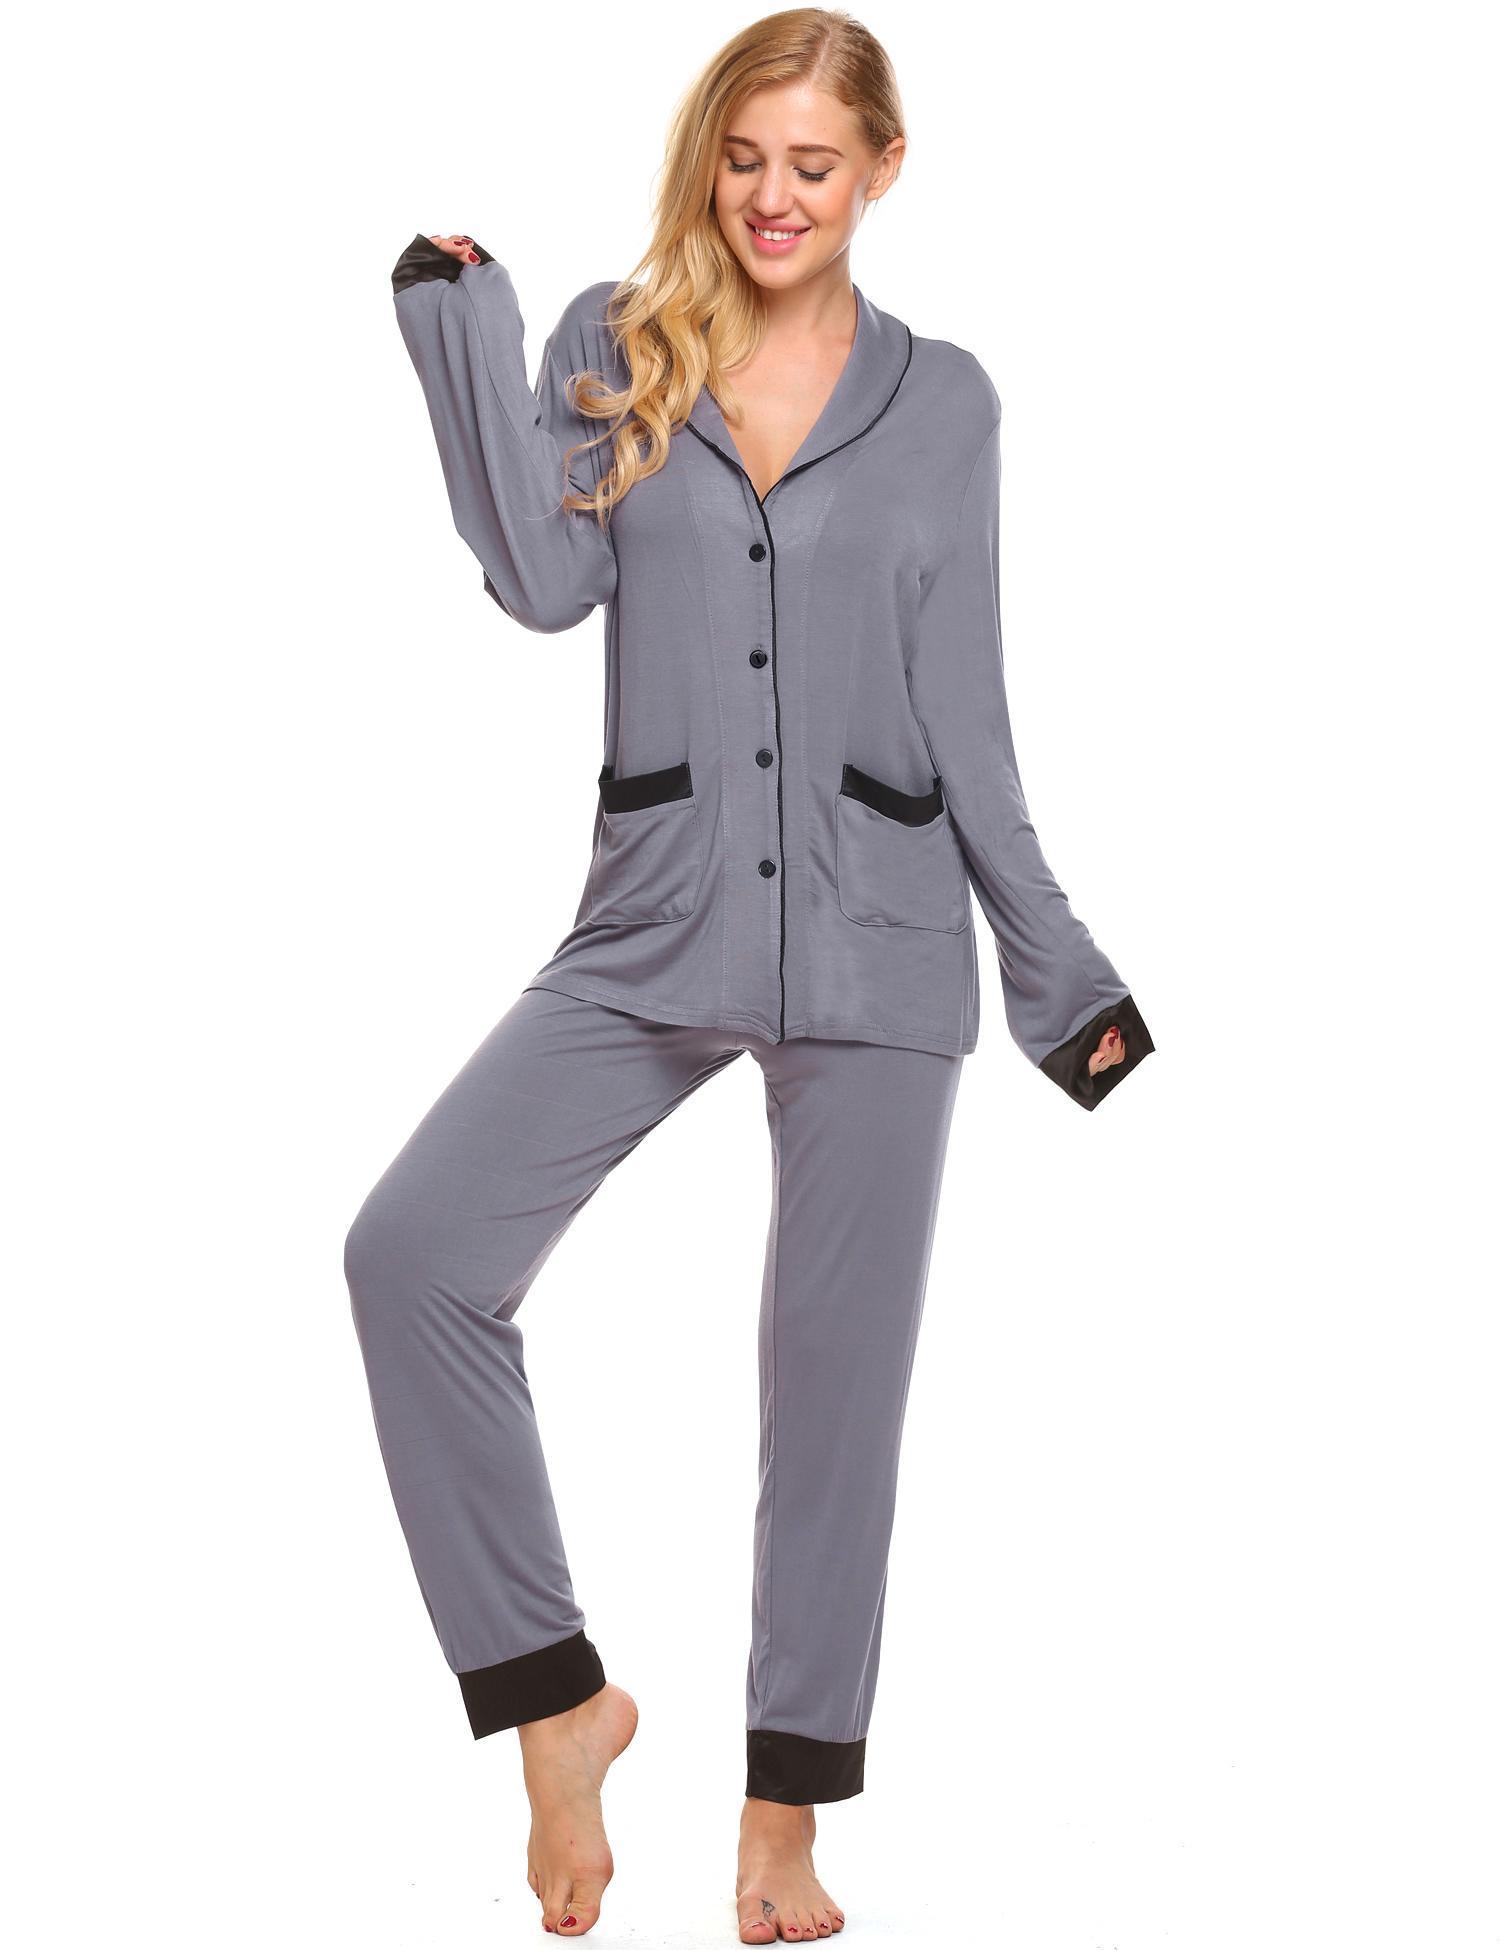 de42f52d637 Bestselling New Women Pajama Pajamas Set Long Sleeve Button-Down Shirt Top  and Long Pants